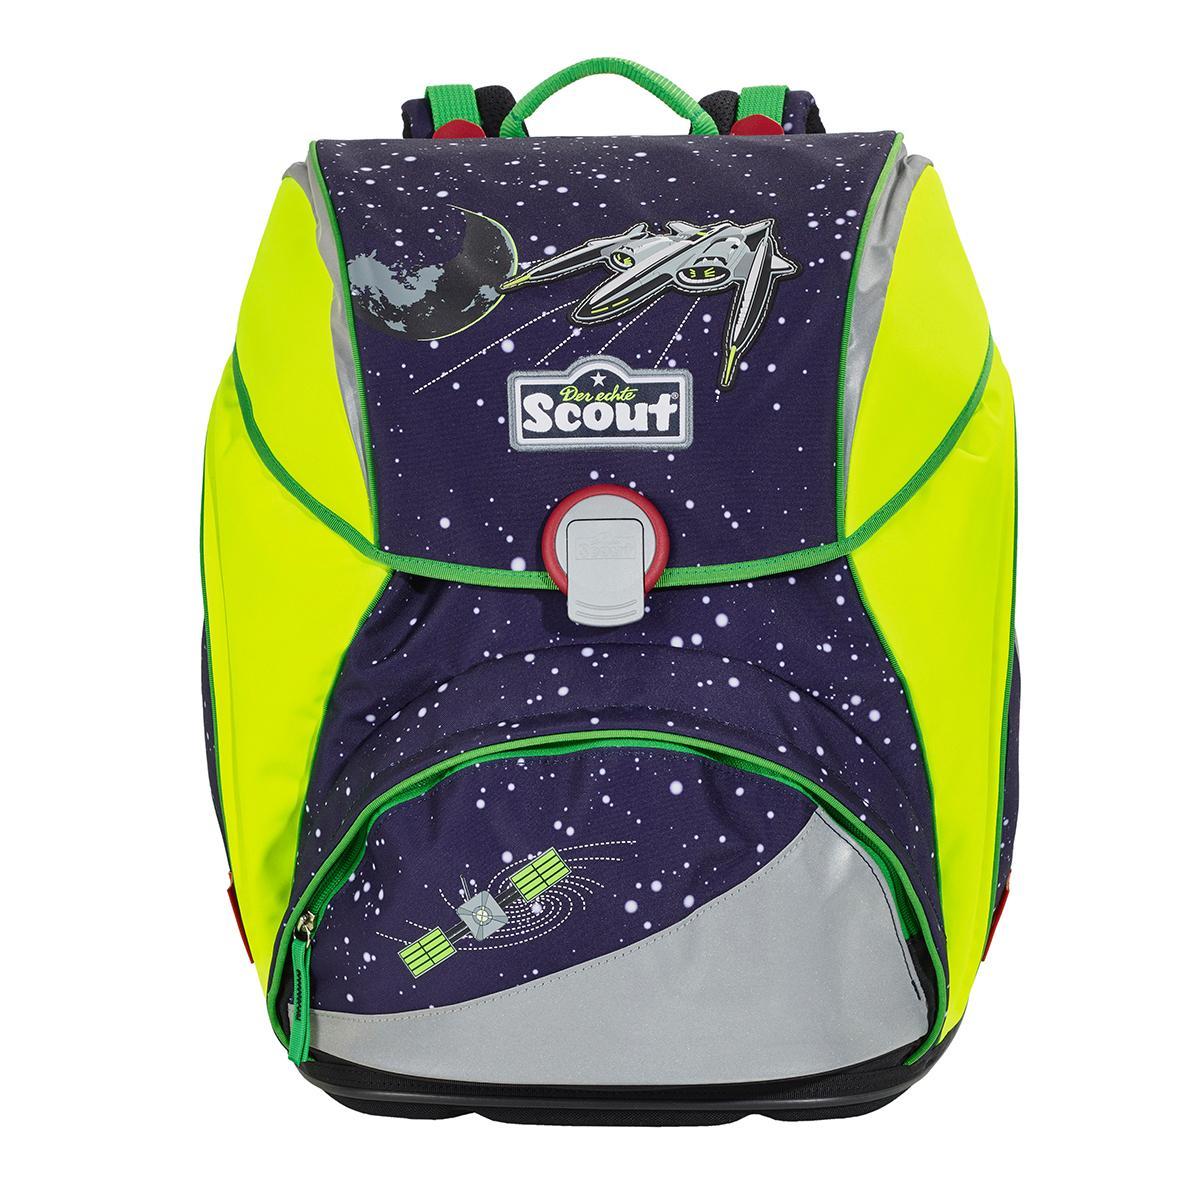 scout-alpha-space-Deails-1